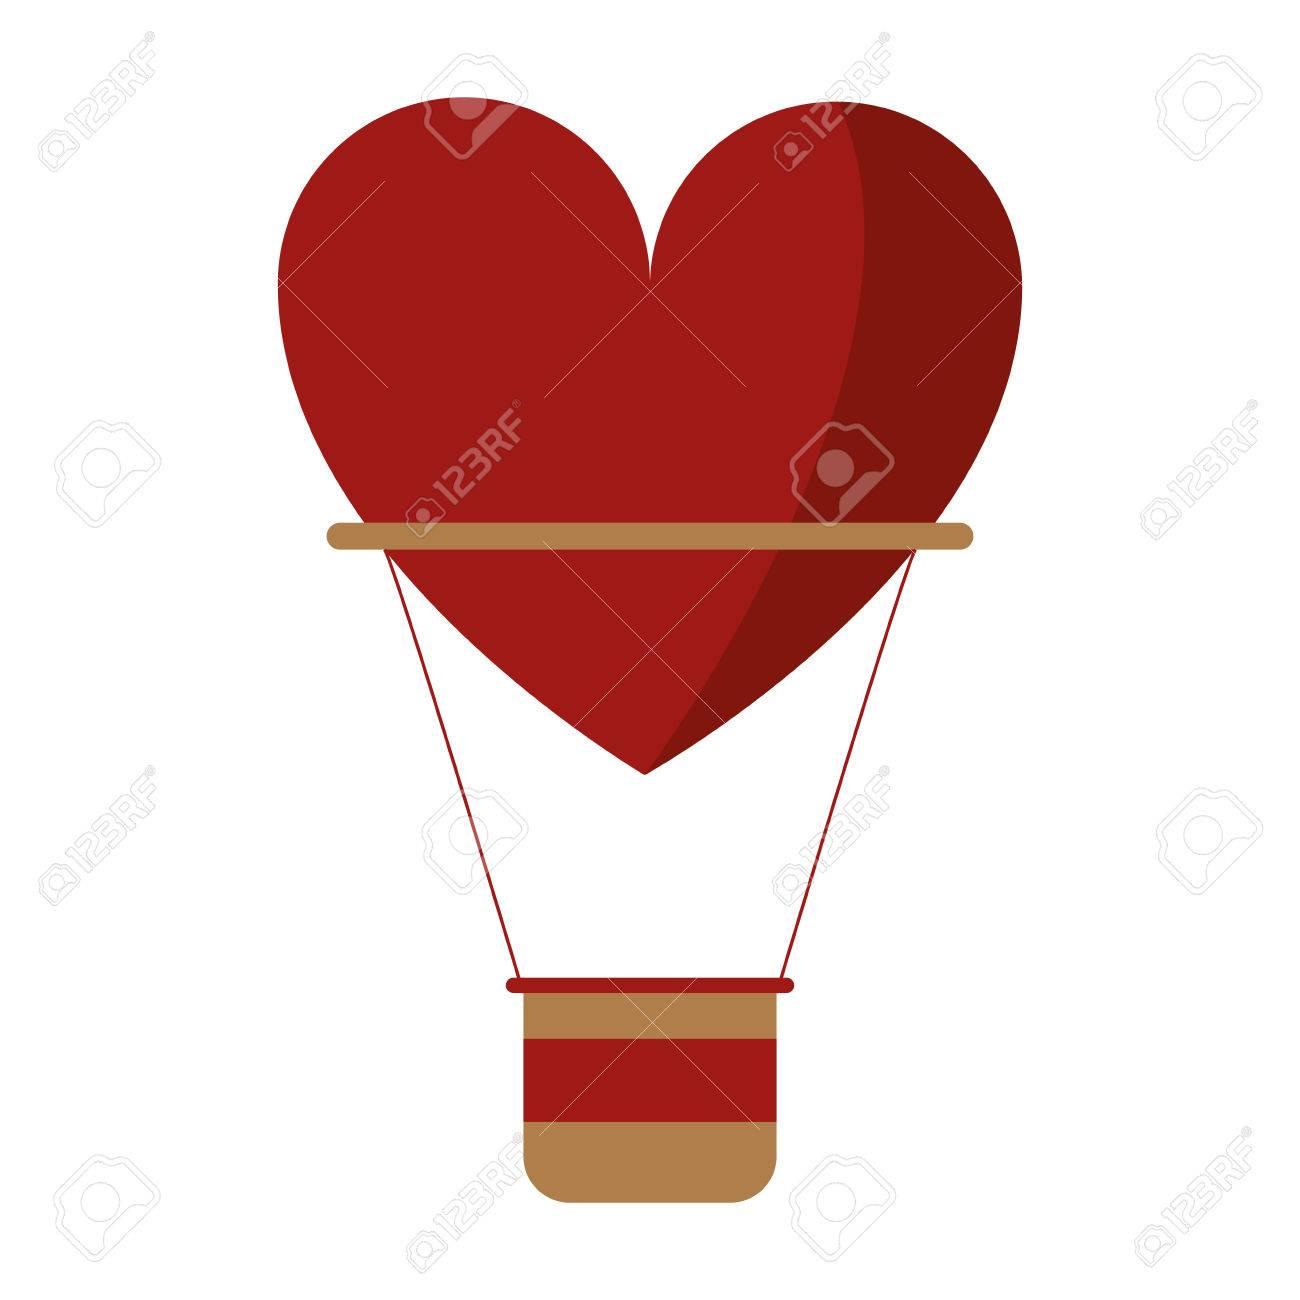 airballon heart love romantic classic vector illustration Stock Vector - 68848601